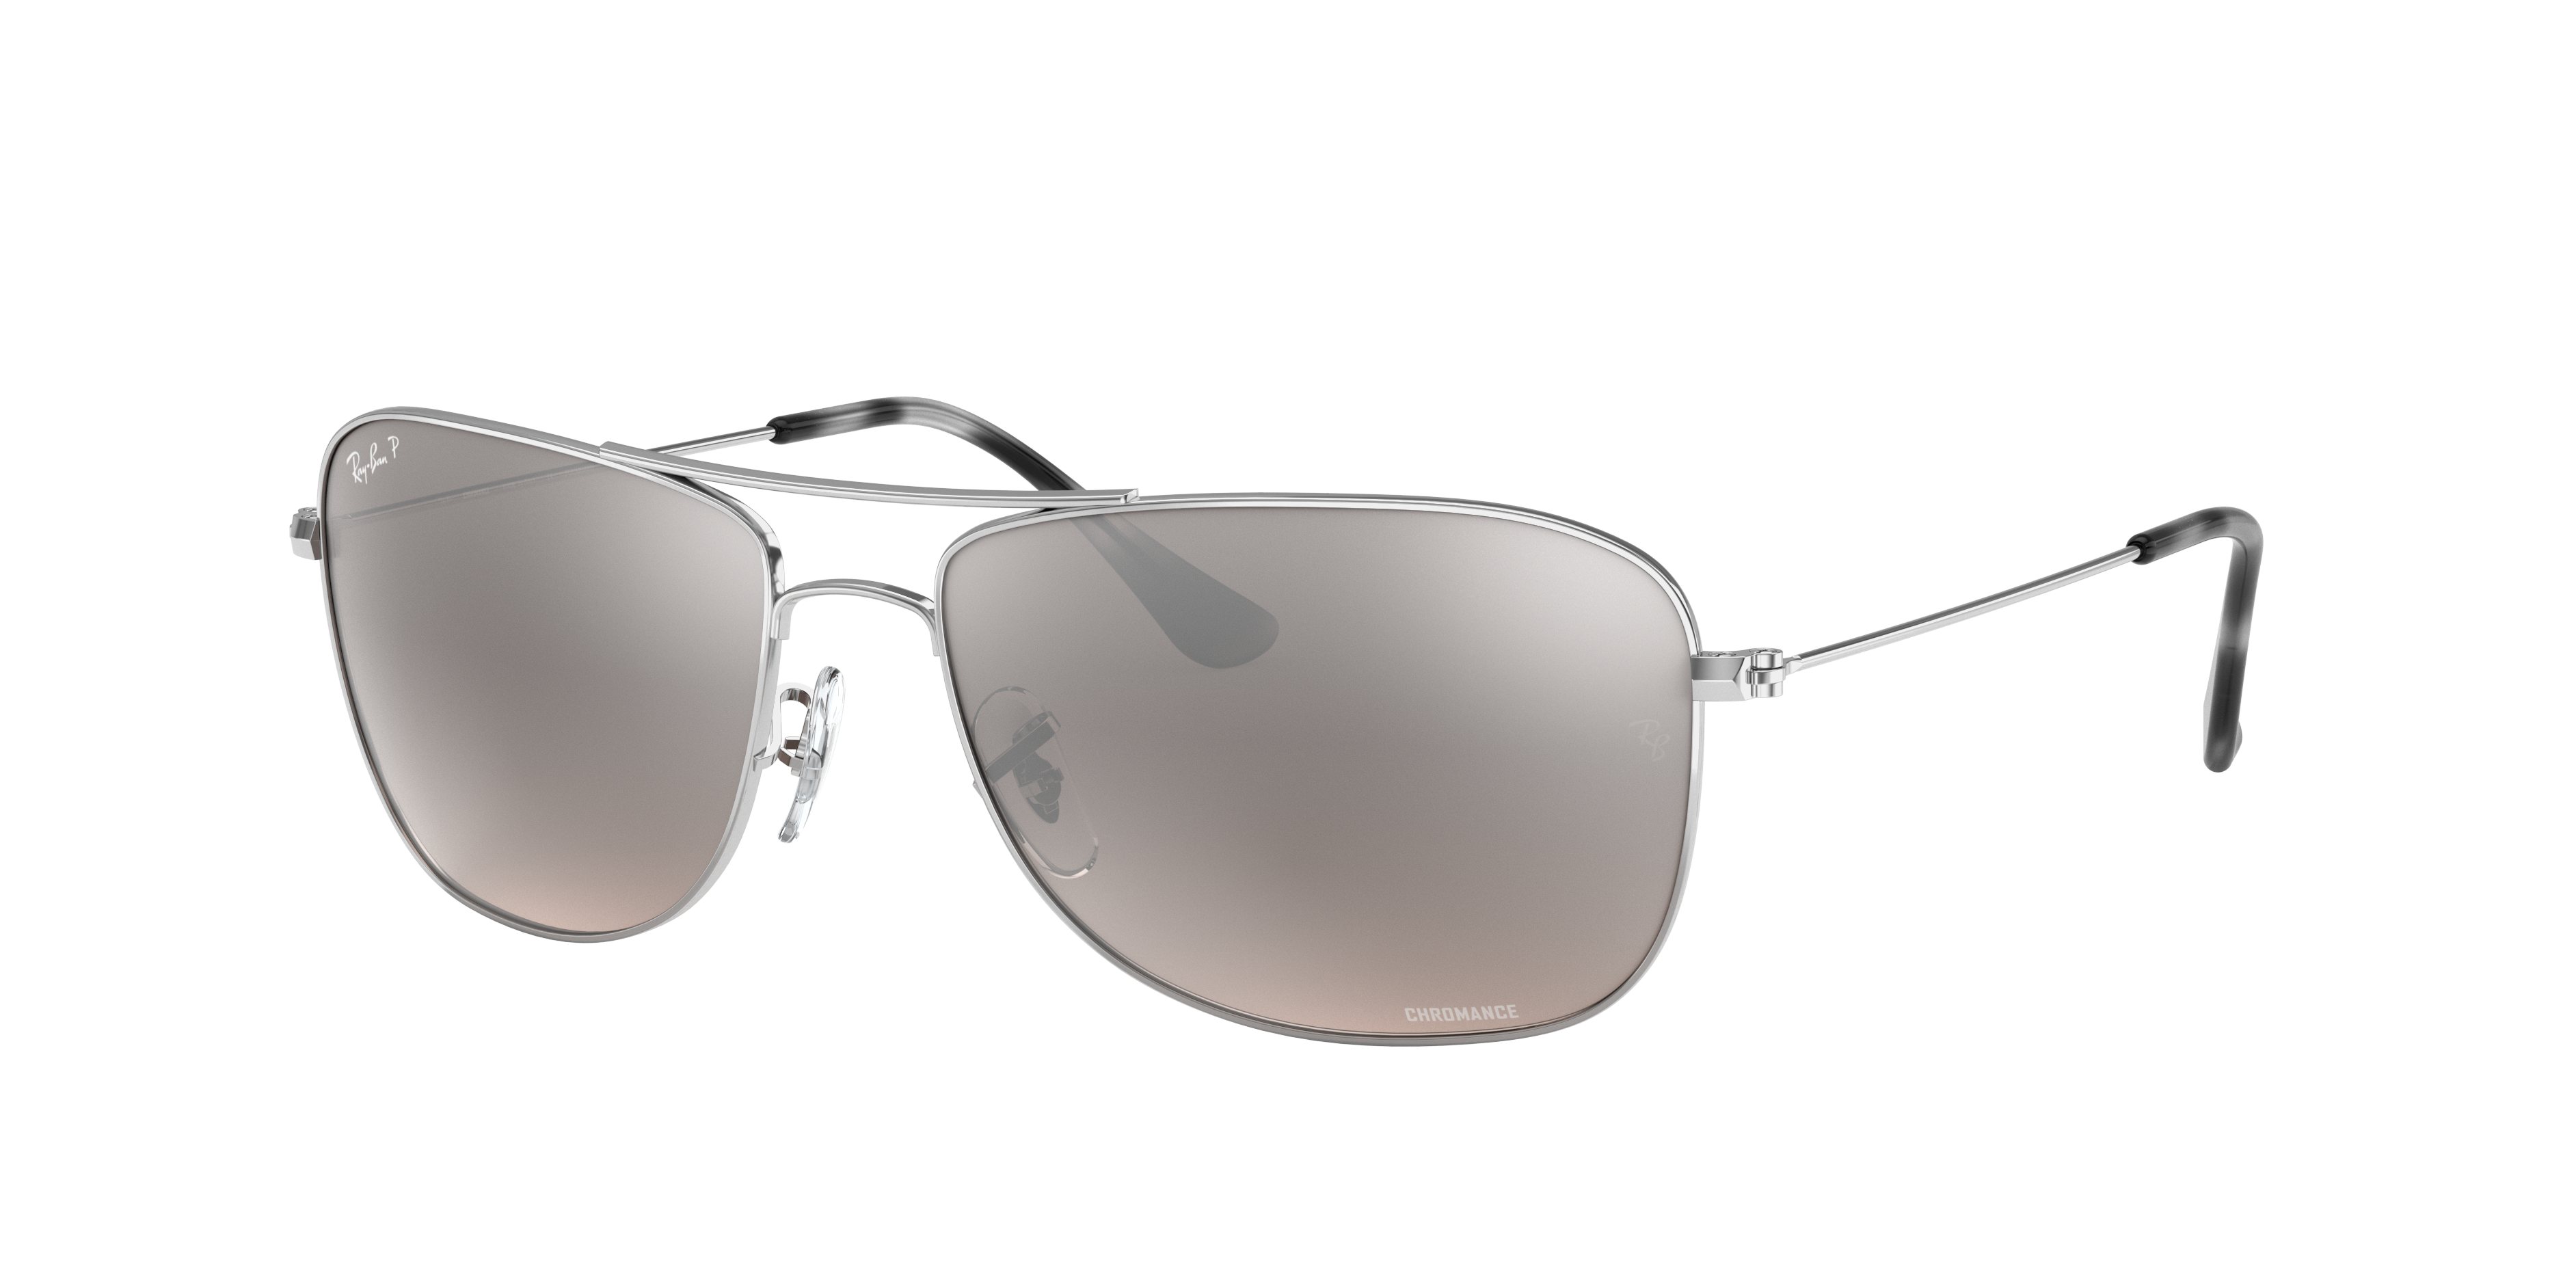 Ray-Ban Rb3543 Chromance Silver, Polarized Gray Lenses - RB3543